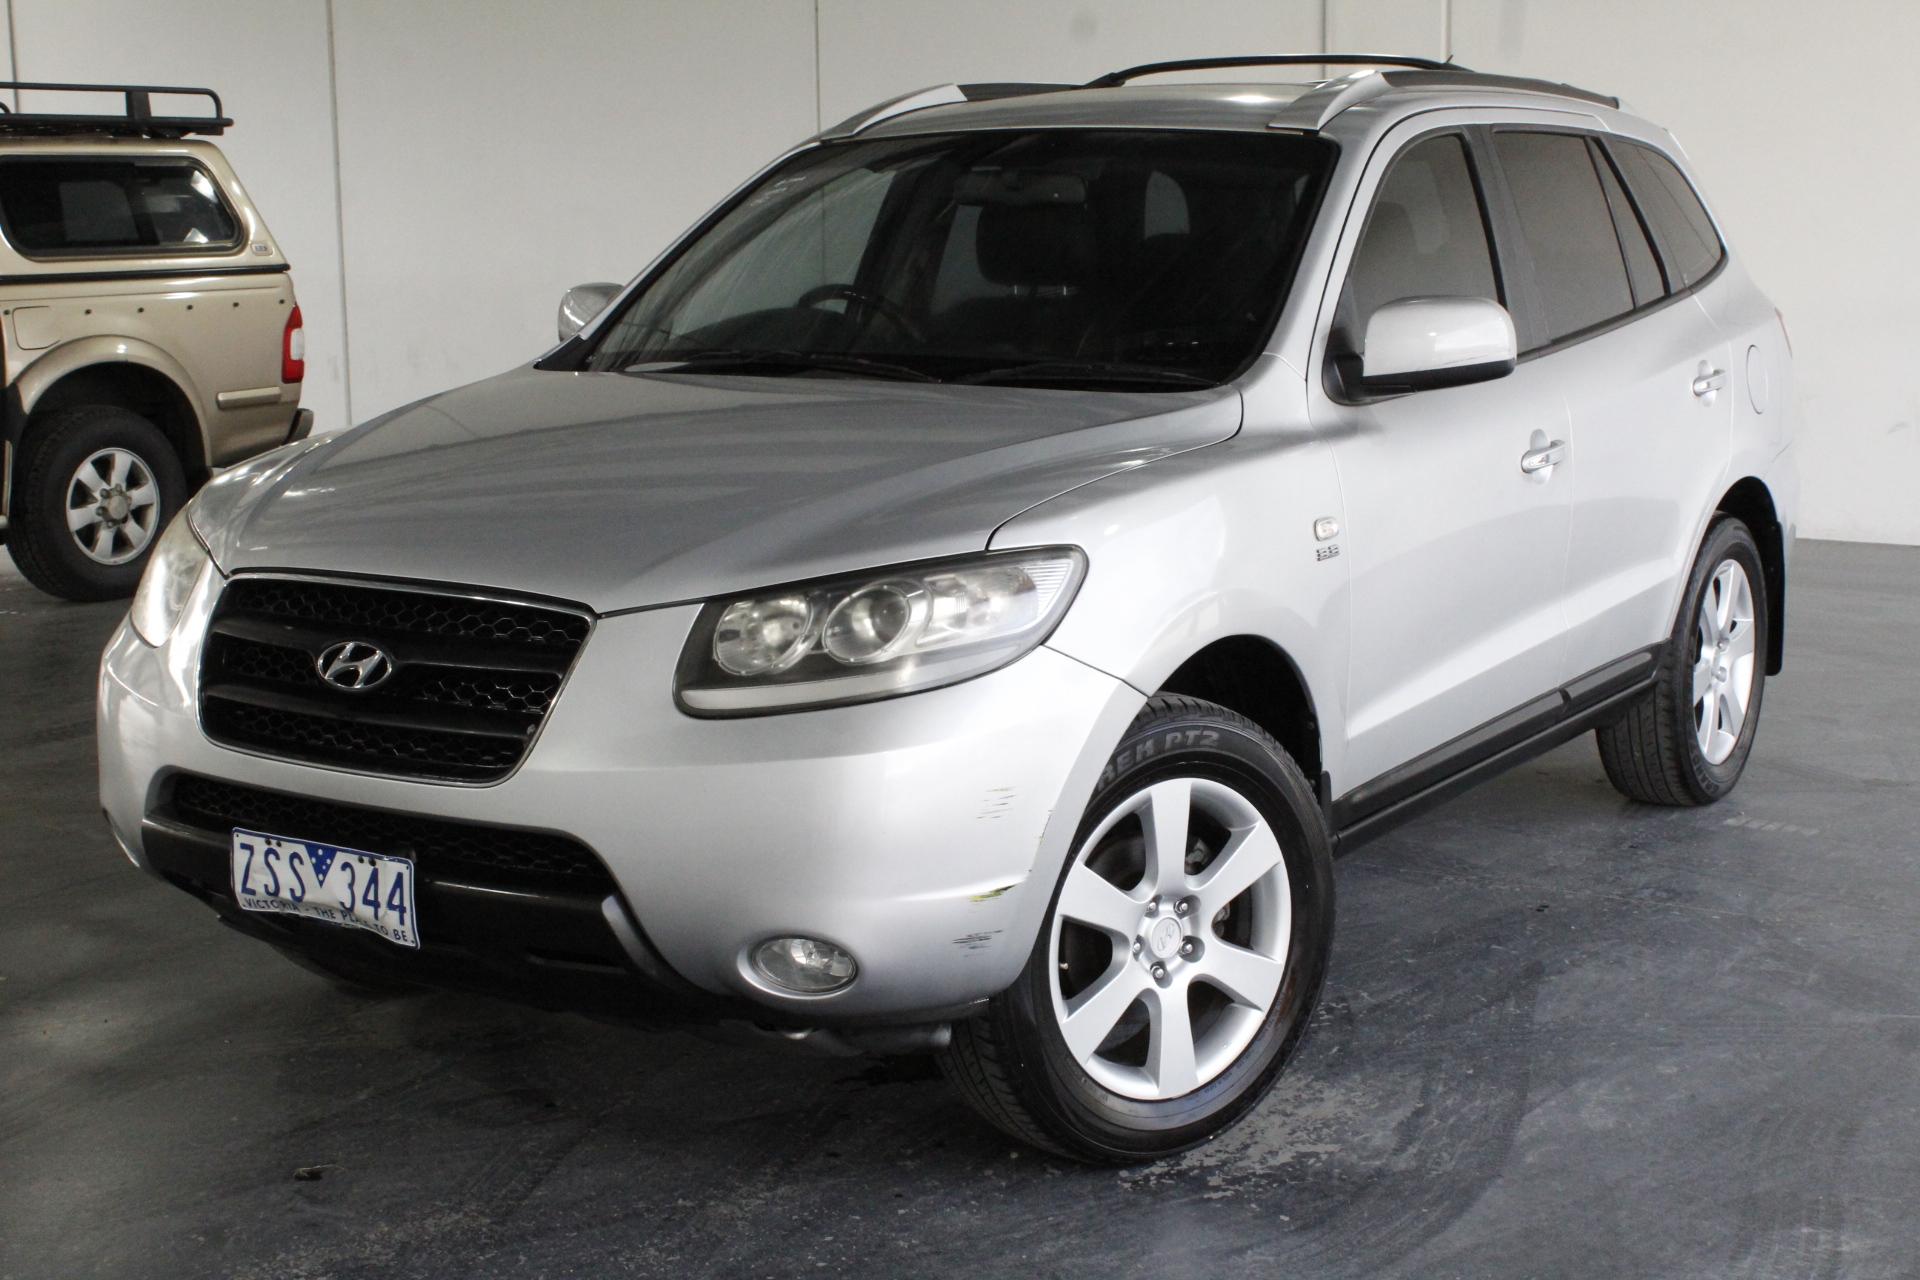 2008 Hyundai Santa Fe ELITE (FWD) CM Automatic 7 Seats Wagon